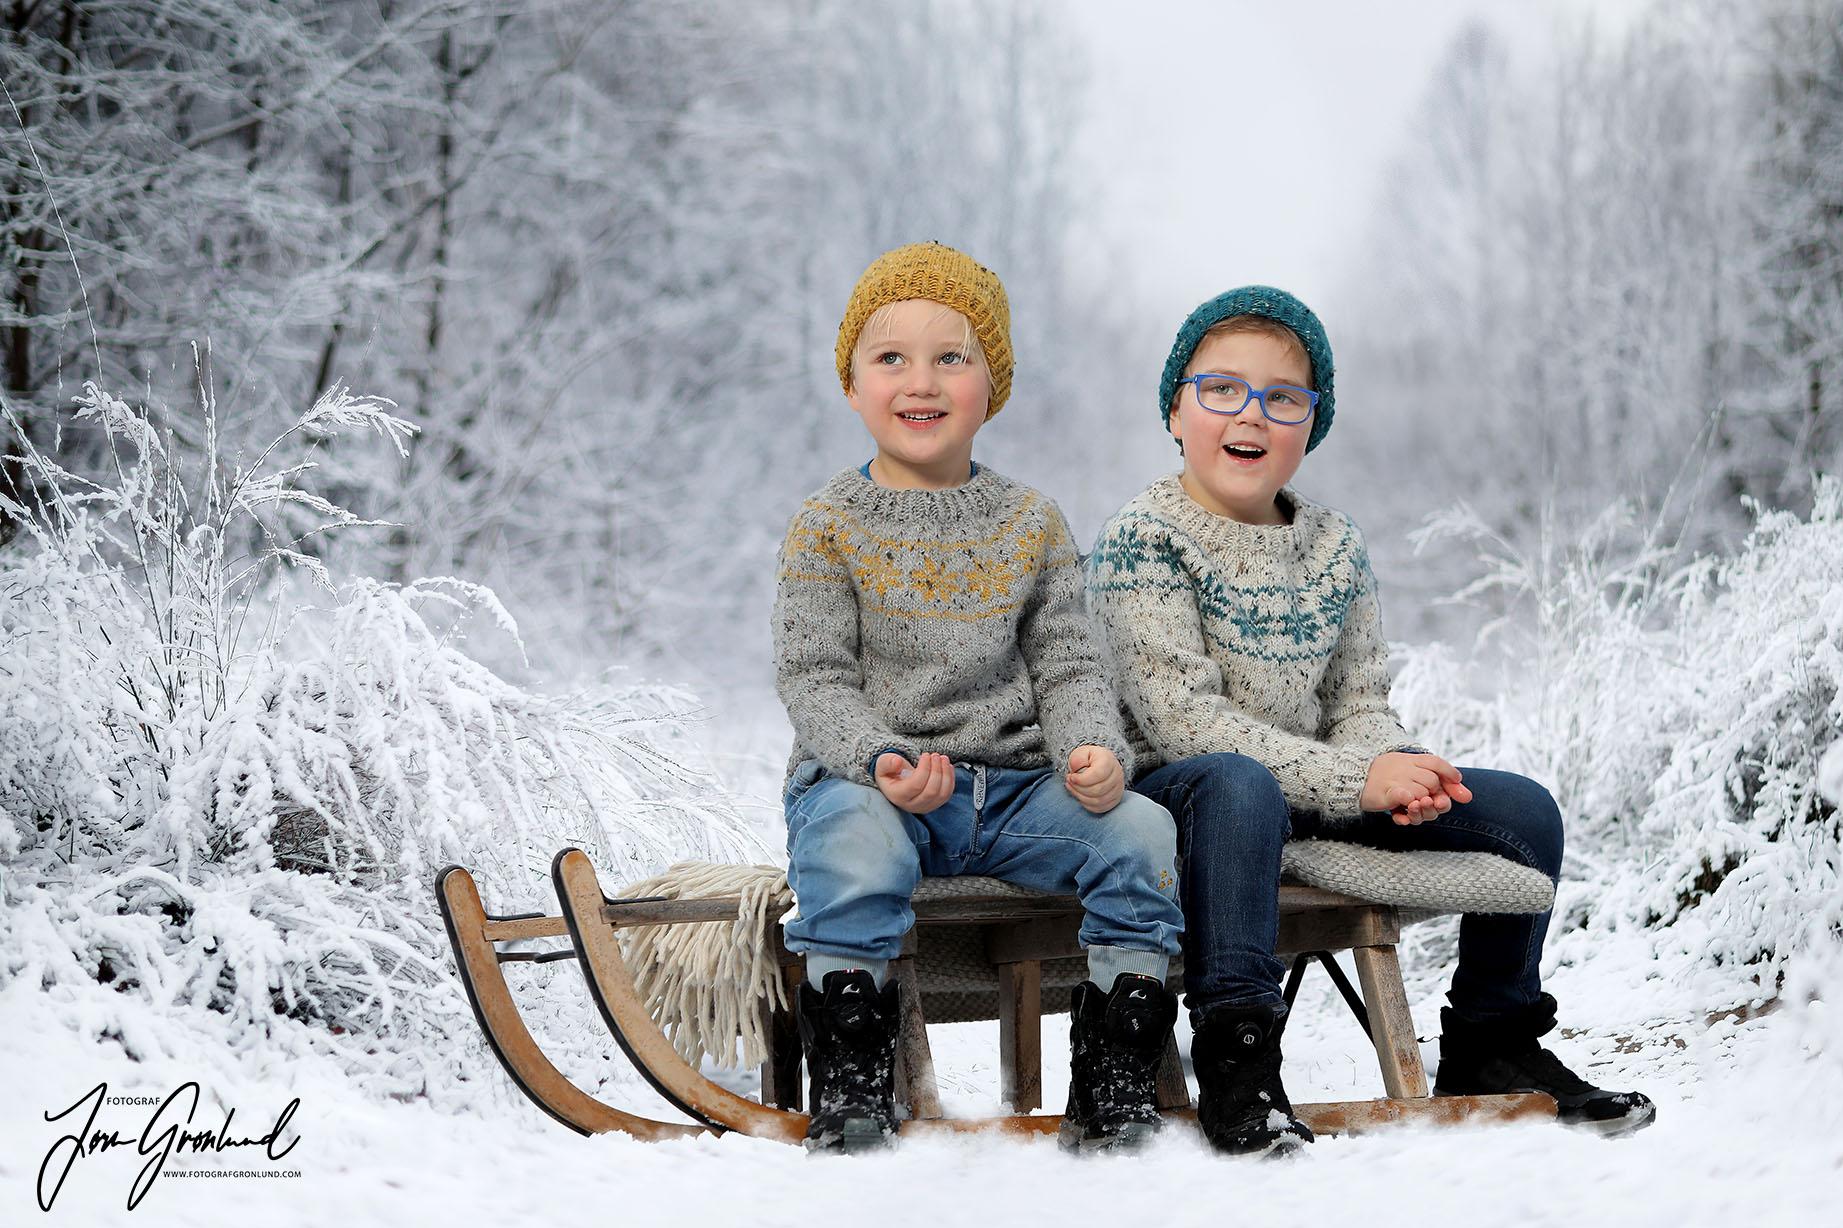 Mathias og Jonas_0296-B_LOW